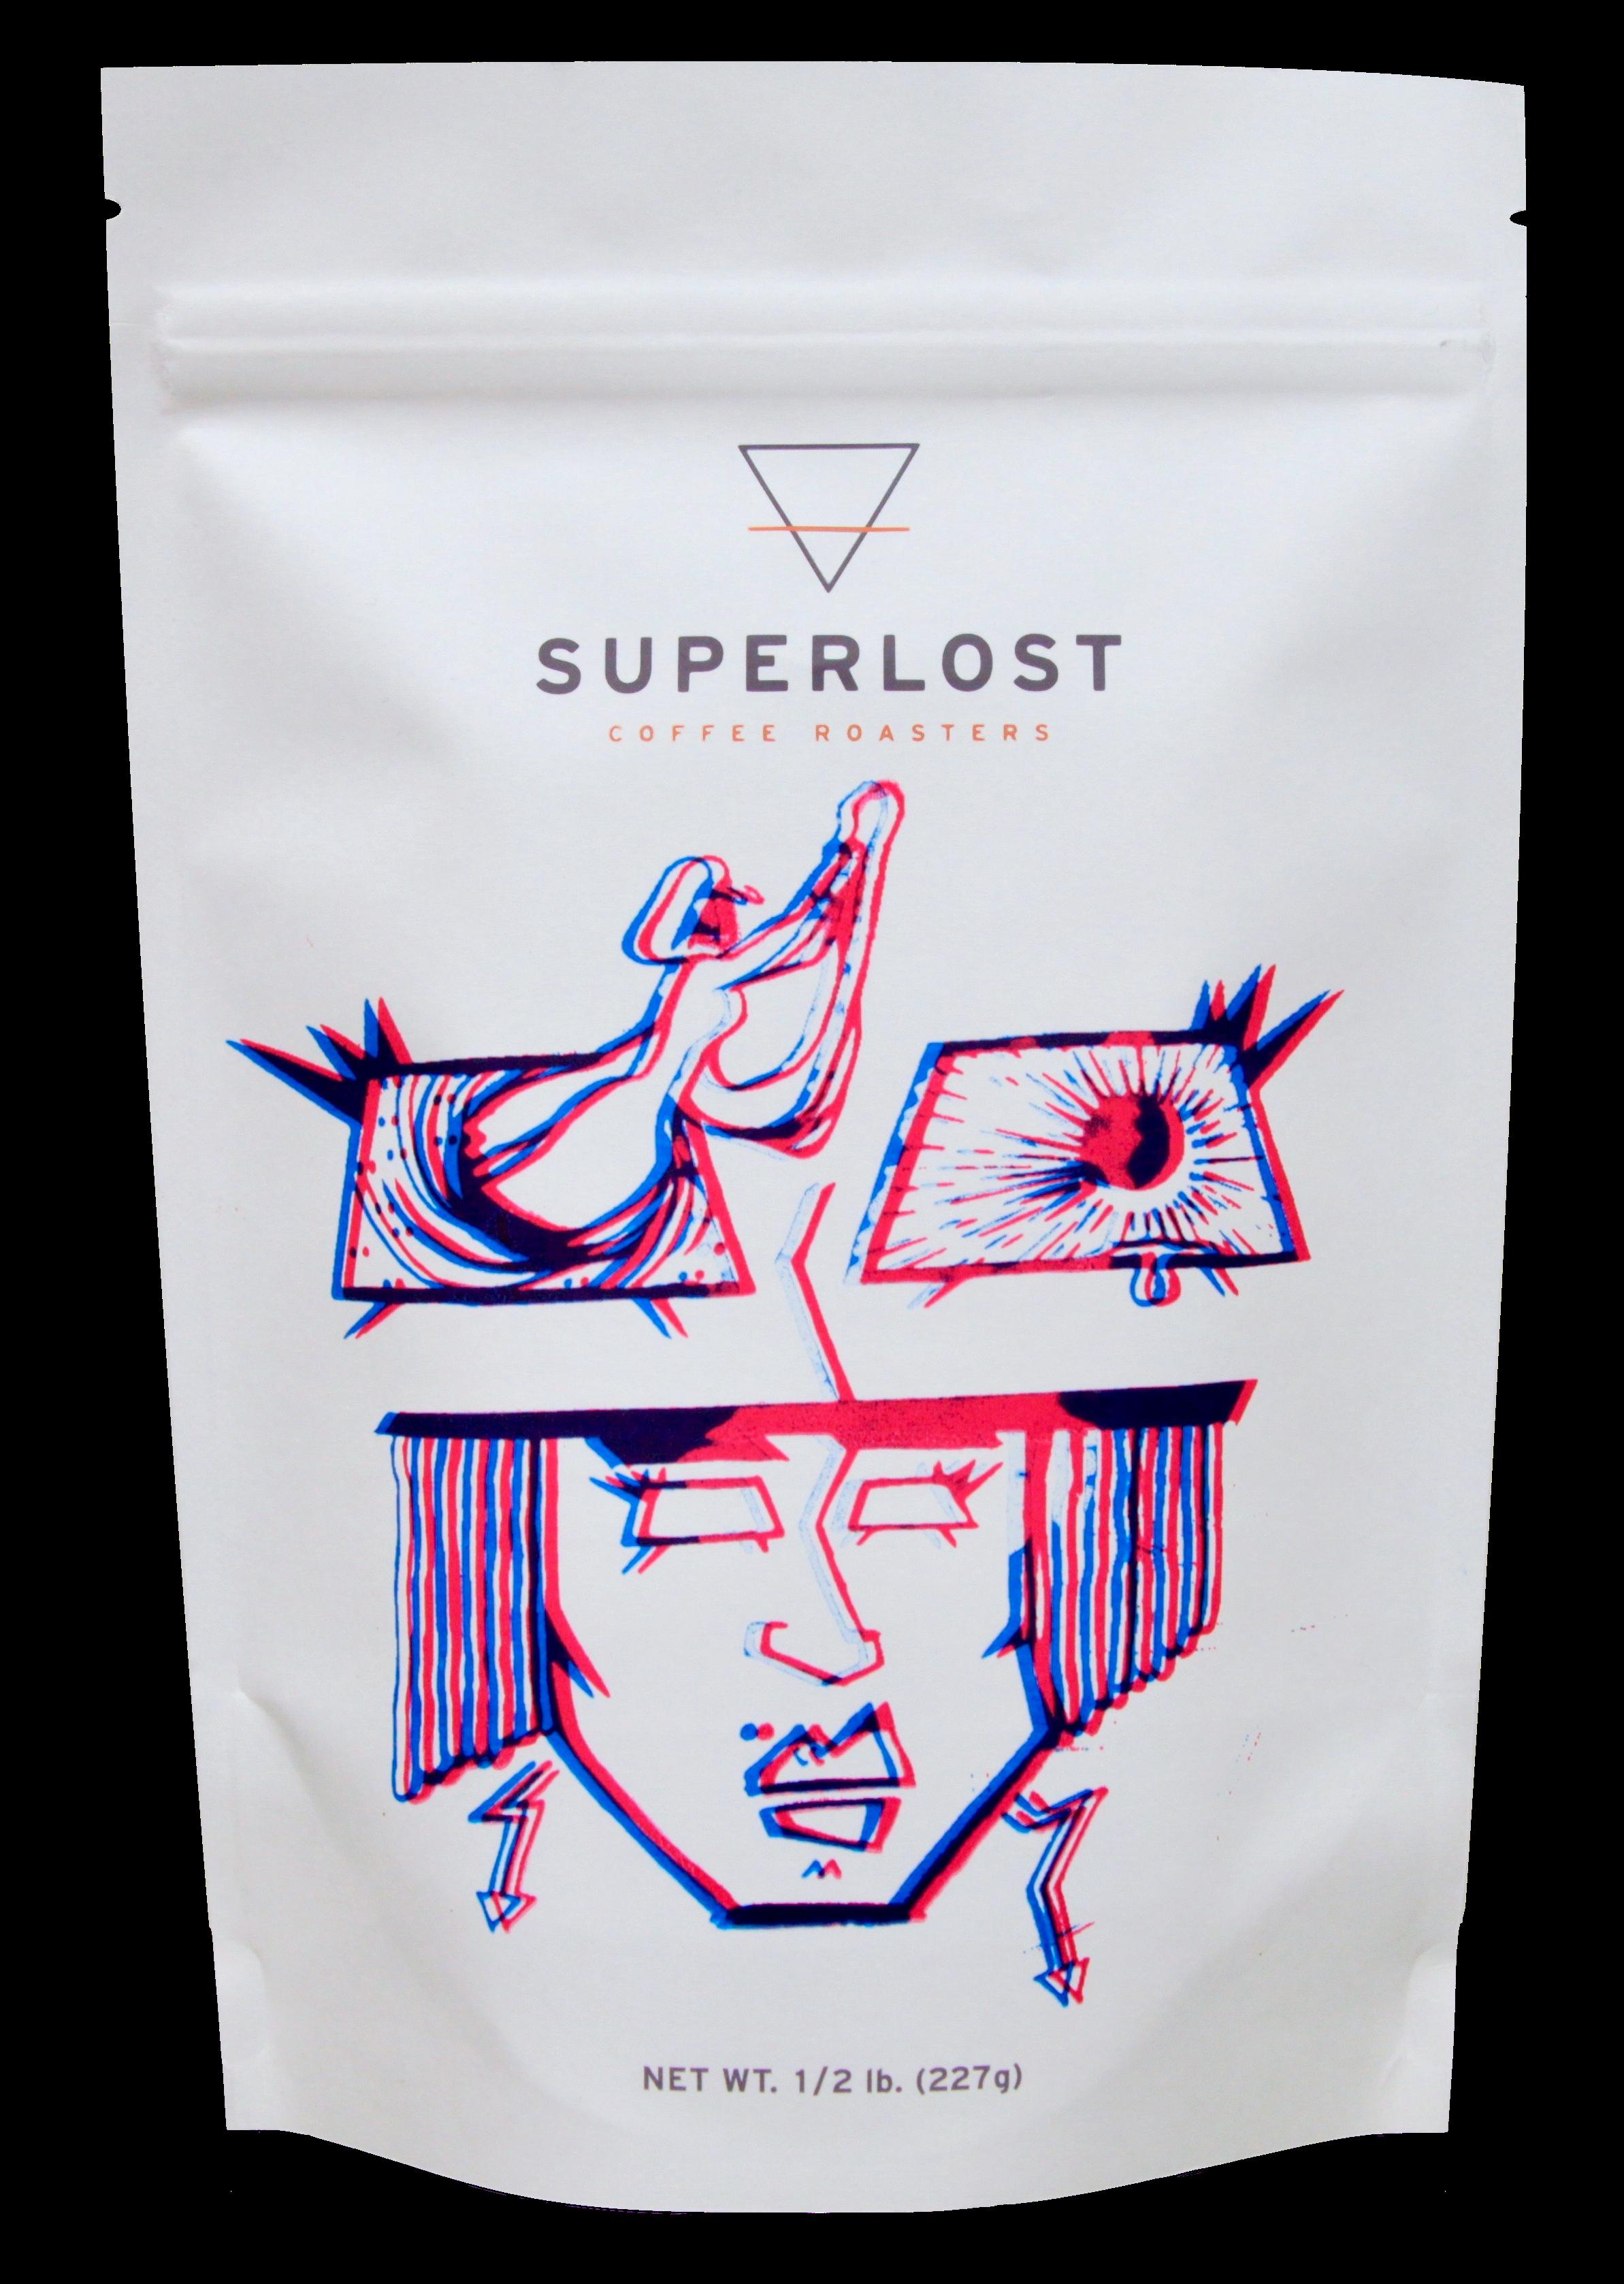 Christian Morris Superlost Coffee